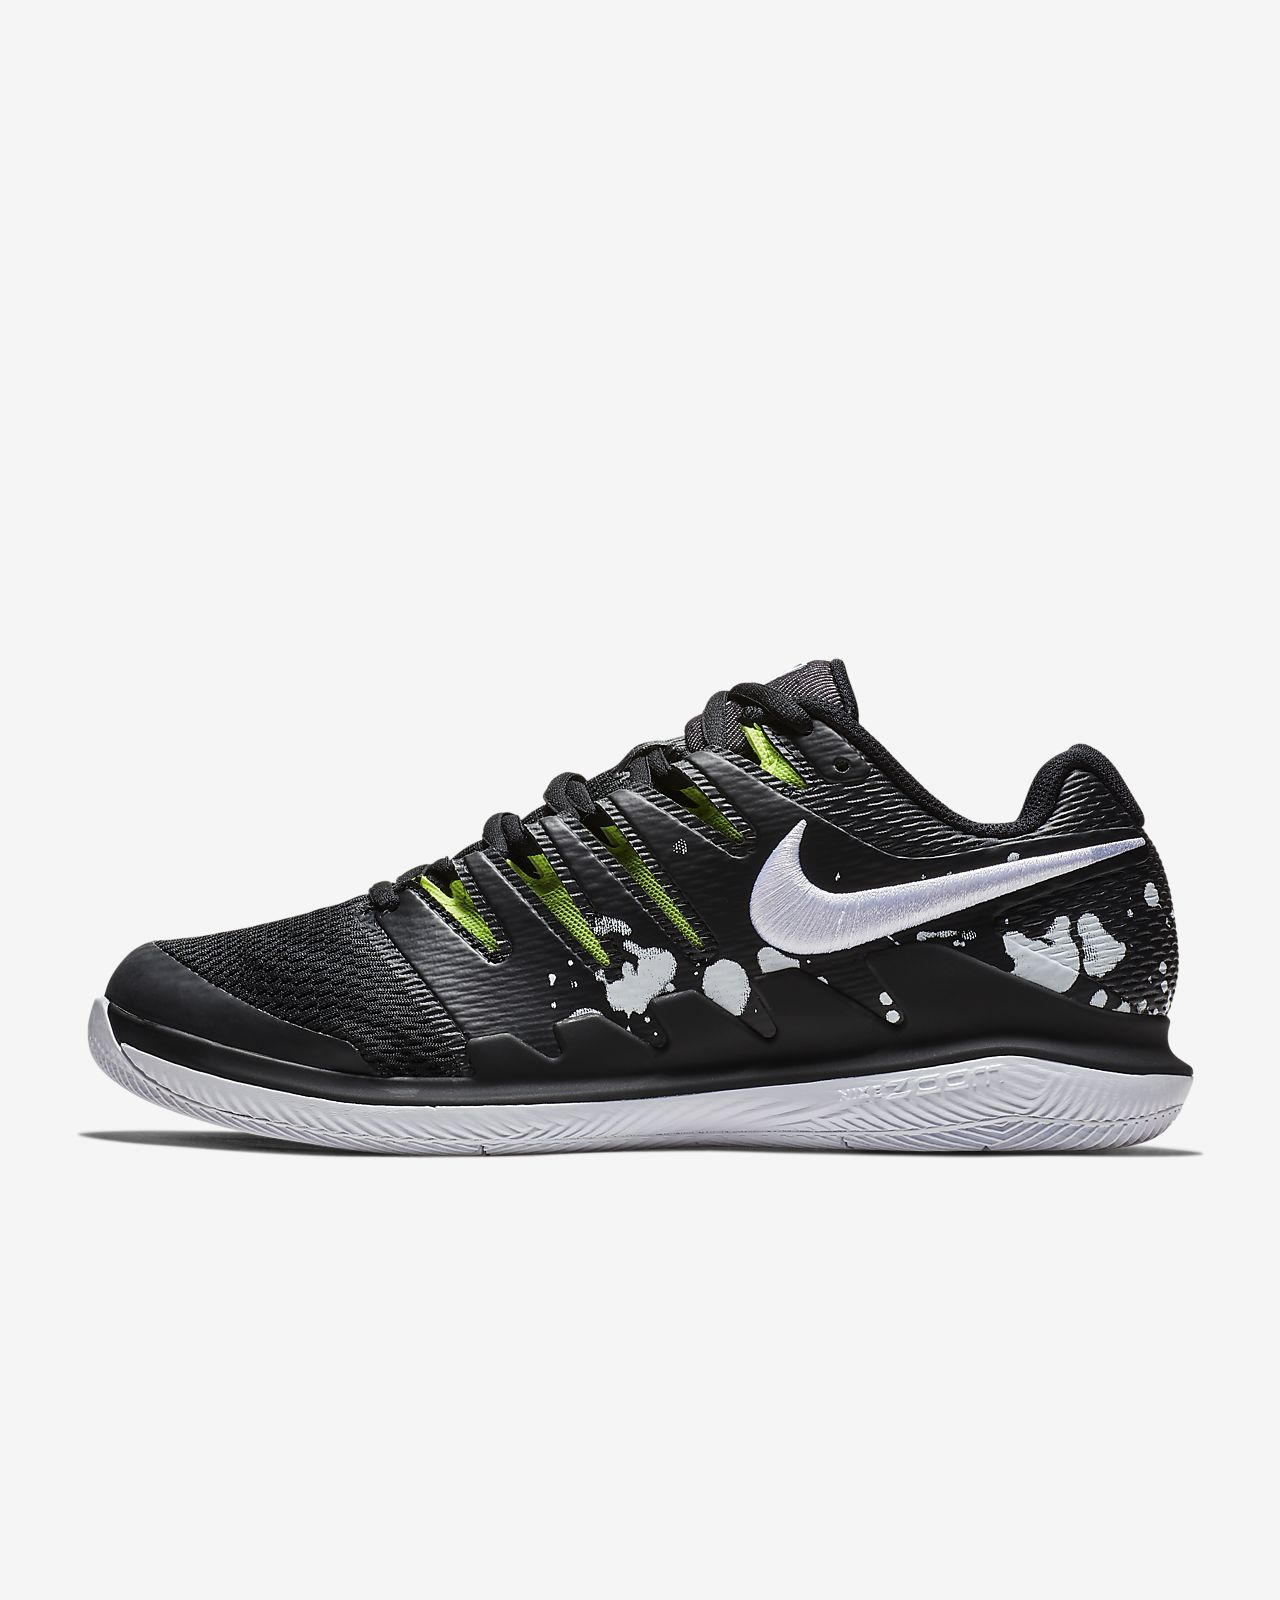 da7fafa2ec9 ... Chaussure de tennis NikeCourt Air Zoom Vapor X Premium Hard Court pour  Homme